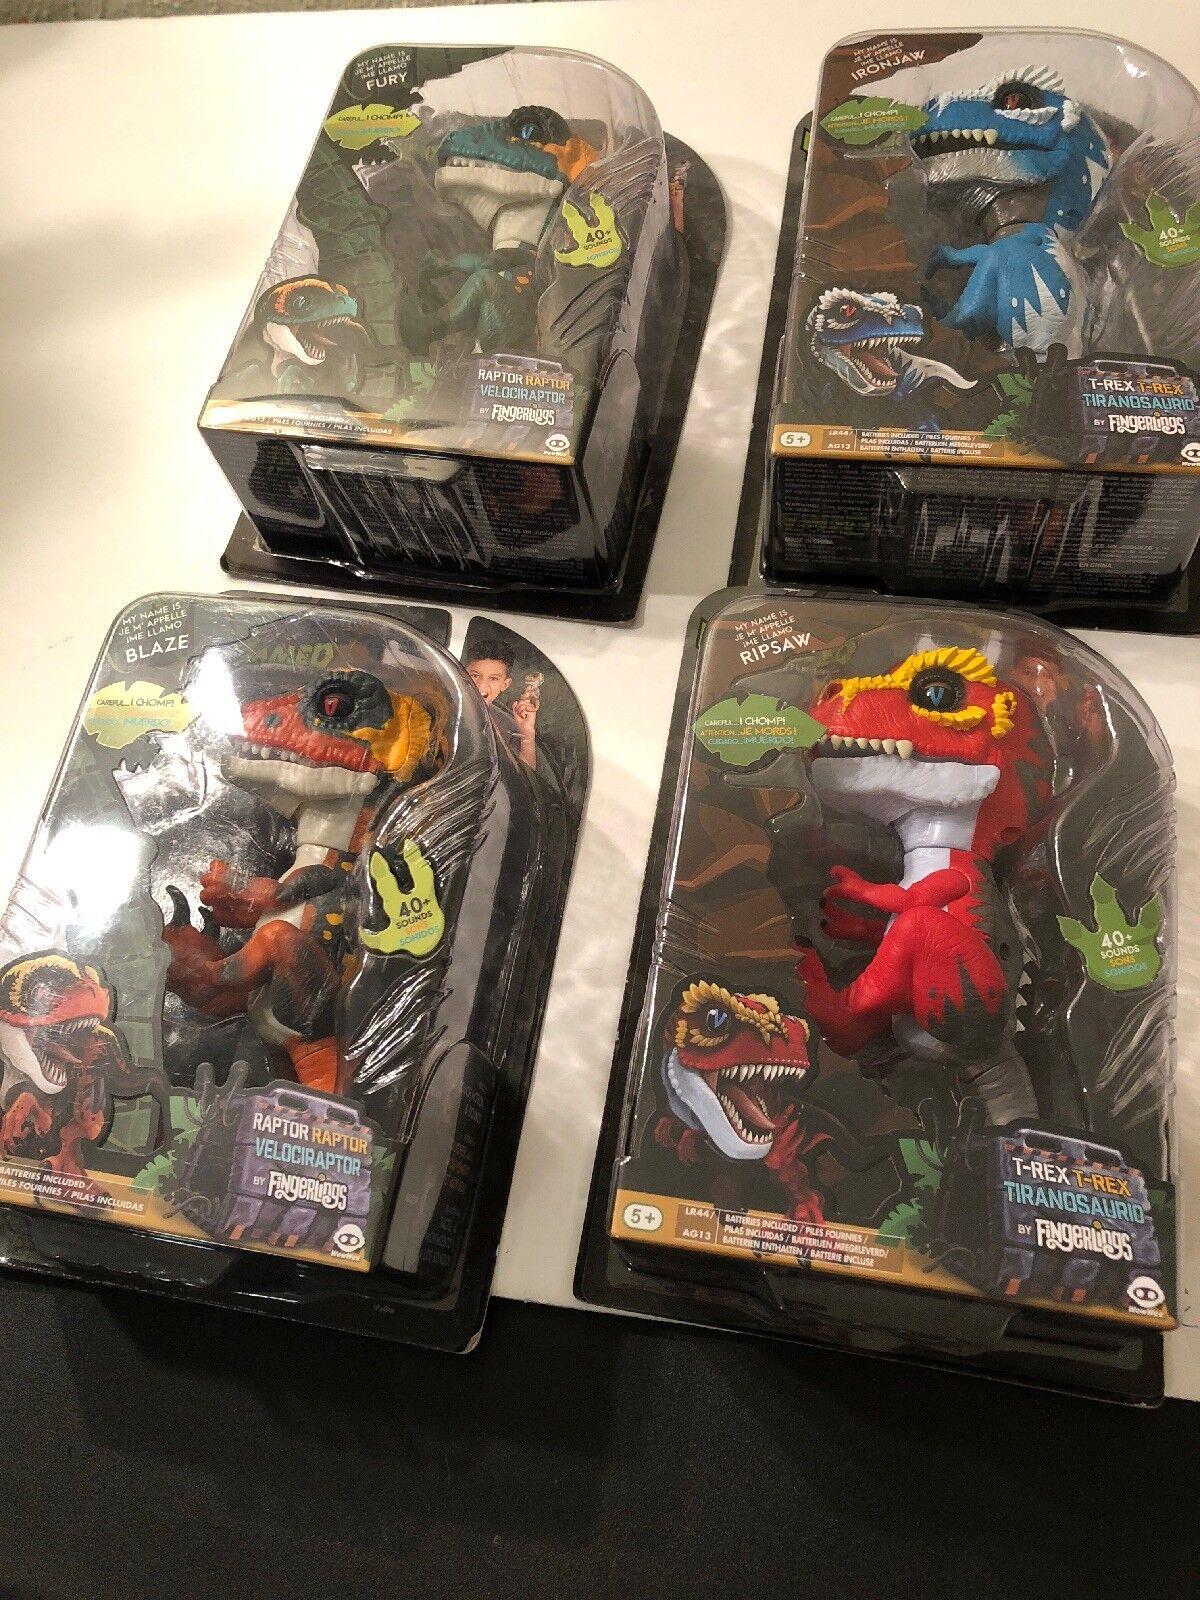 4 Untamed Fingerlings T-REX Dinosaurs Blaze Ripsaw Fury IronJaw - FAST SHIPPING